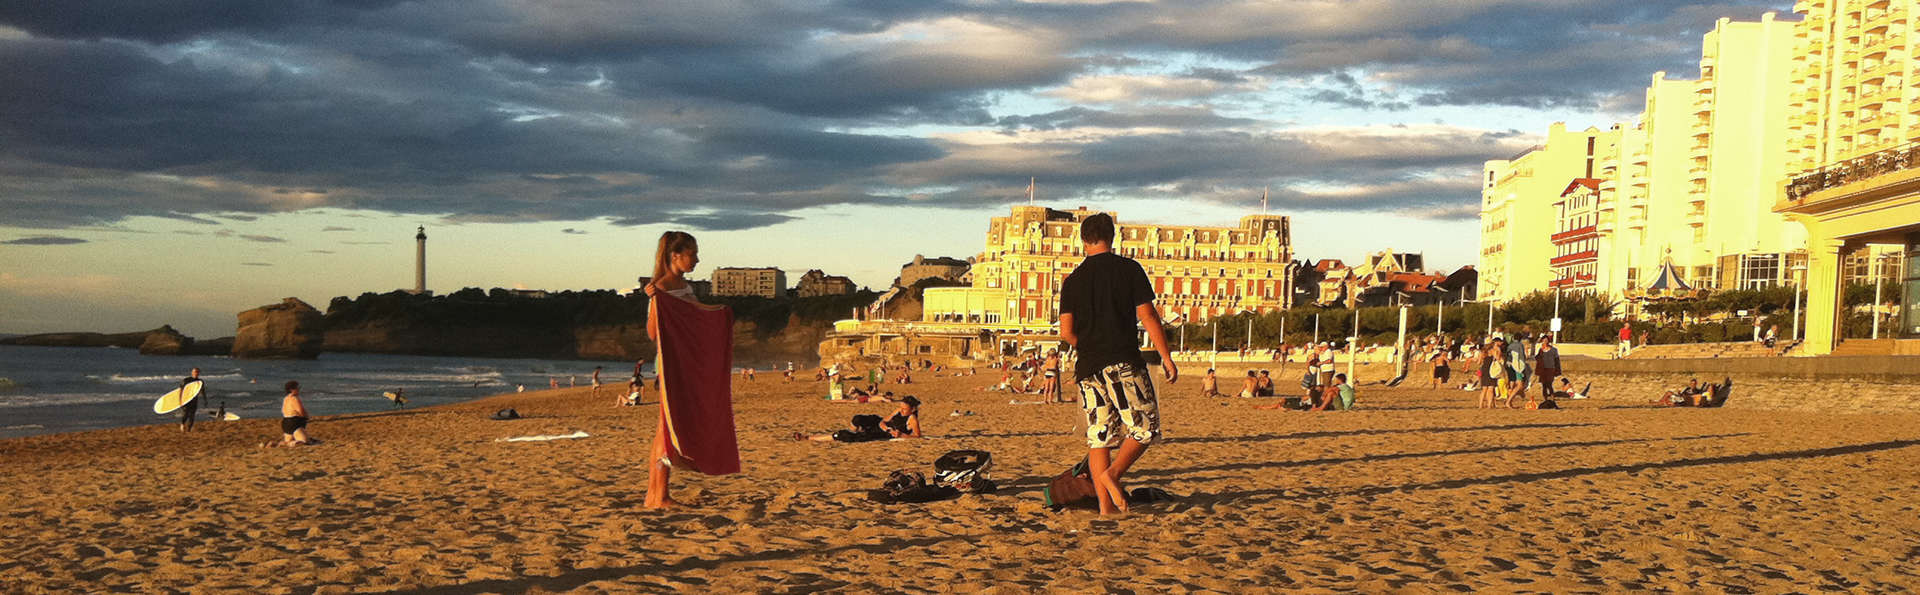 La Maison du Lierre - edit_beach_biarritz2.jpg